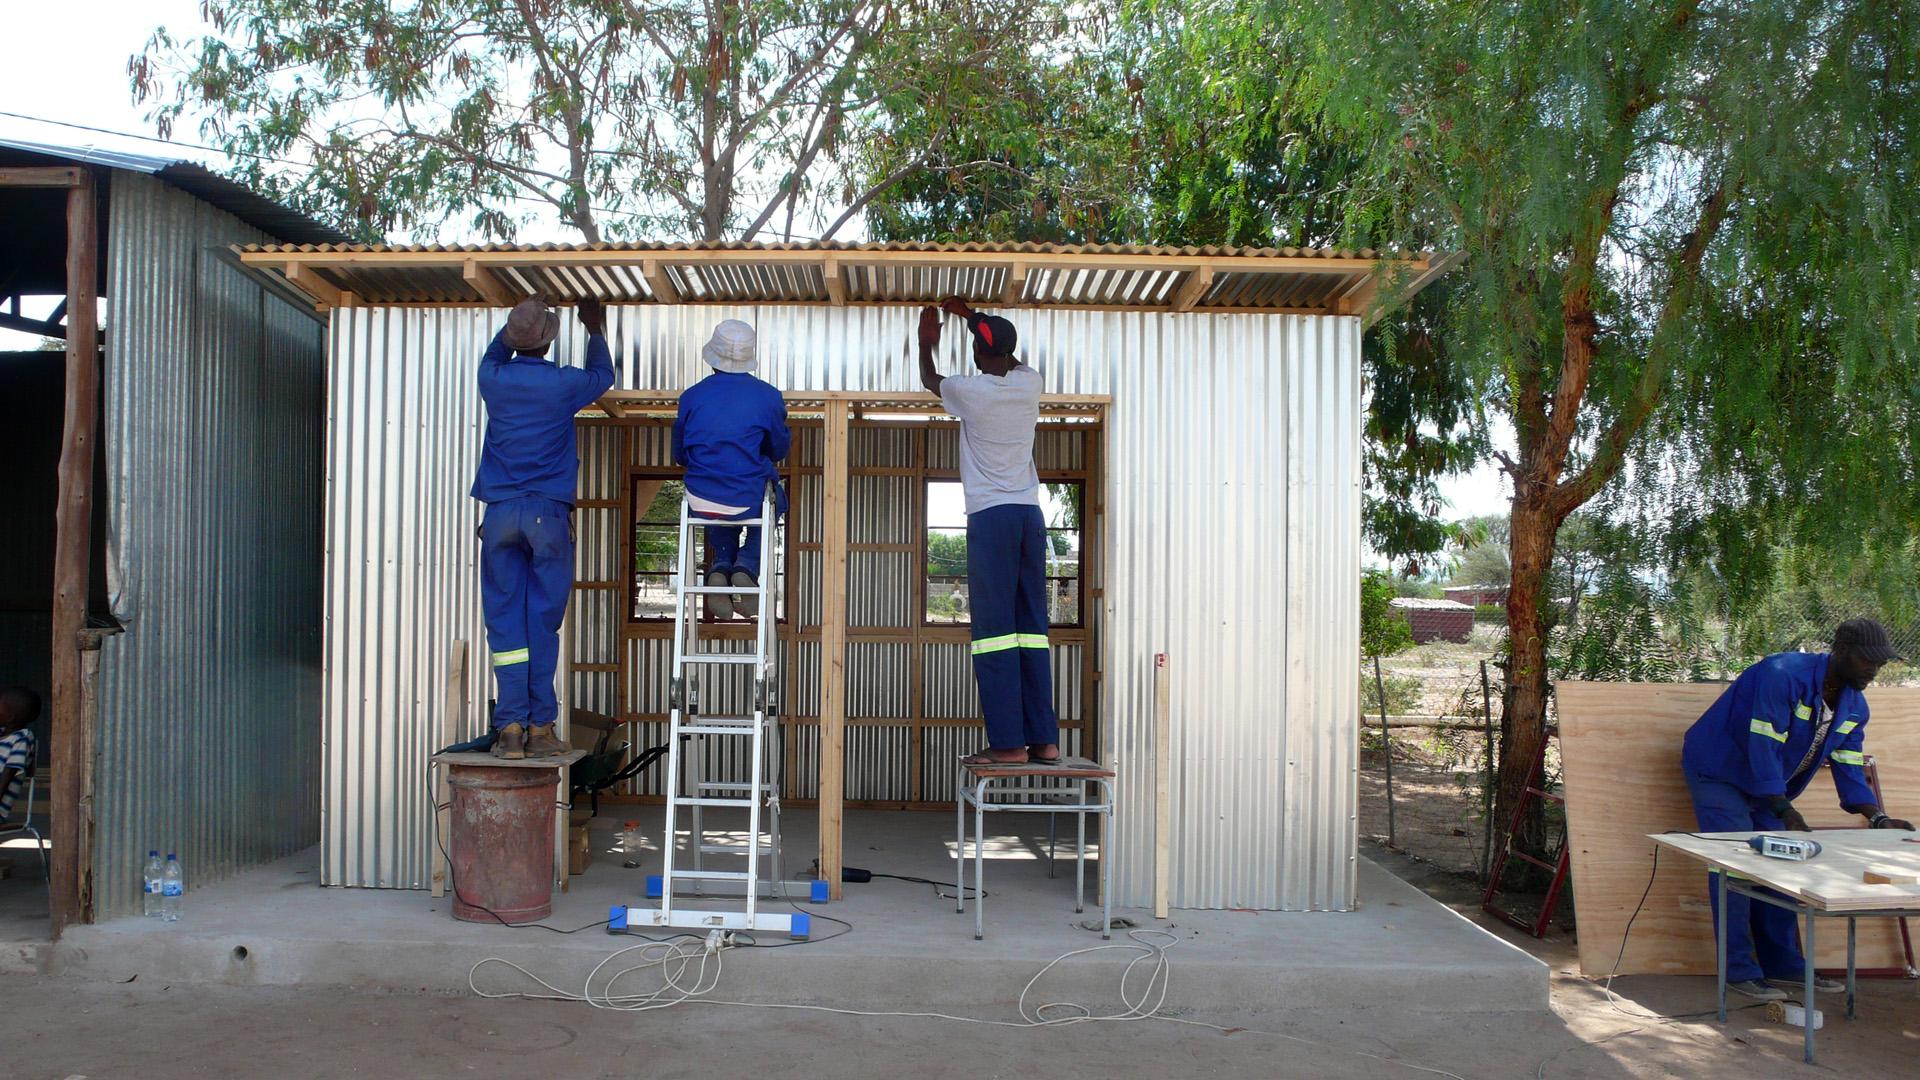 corrugated iron construction of the schoolgarden kitchen